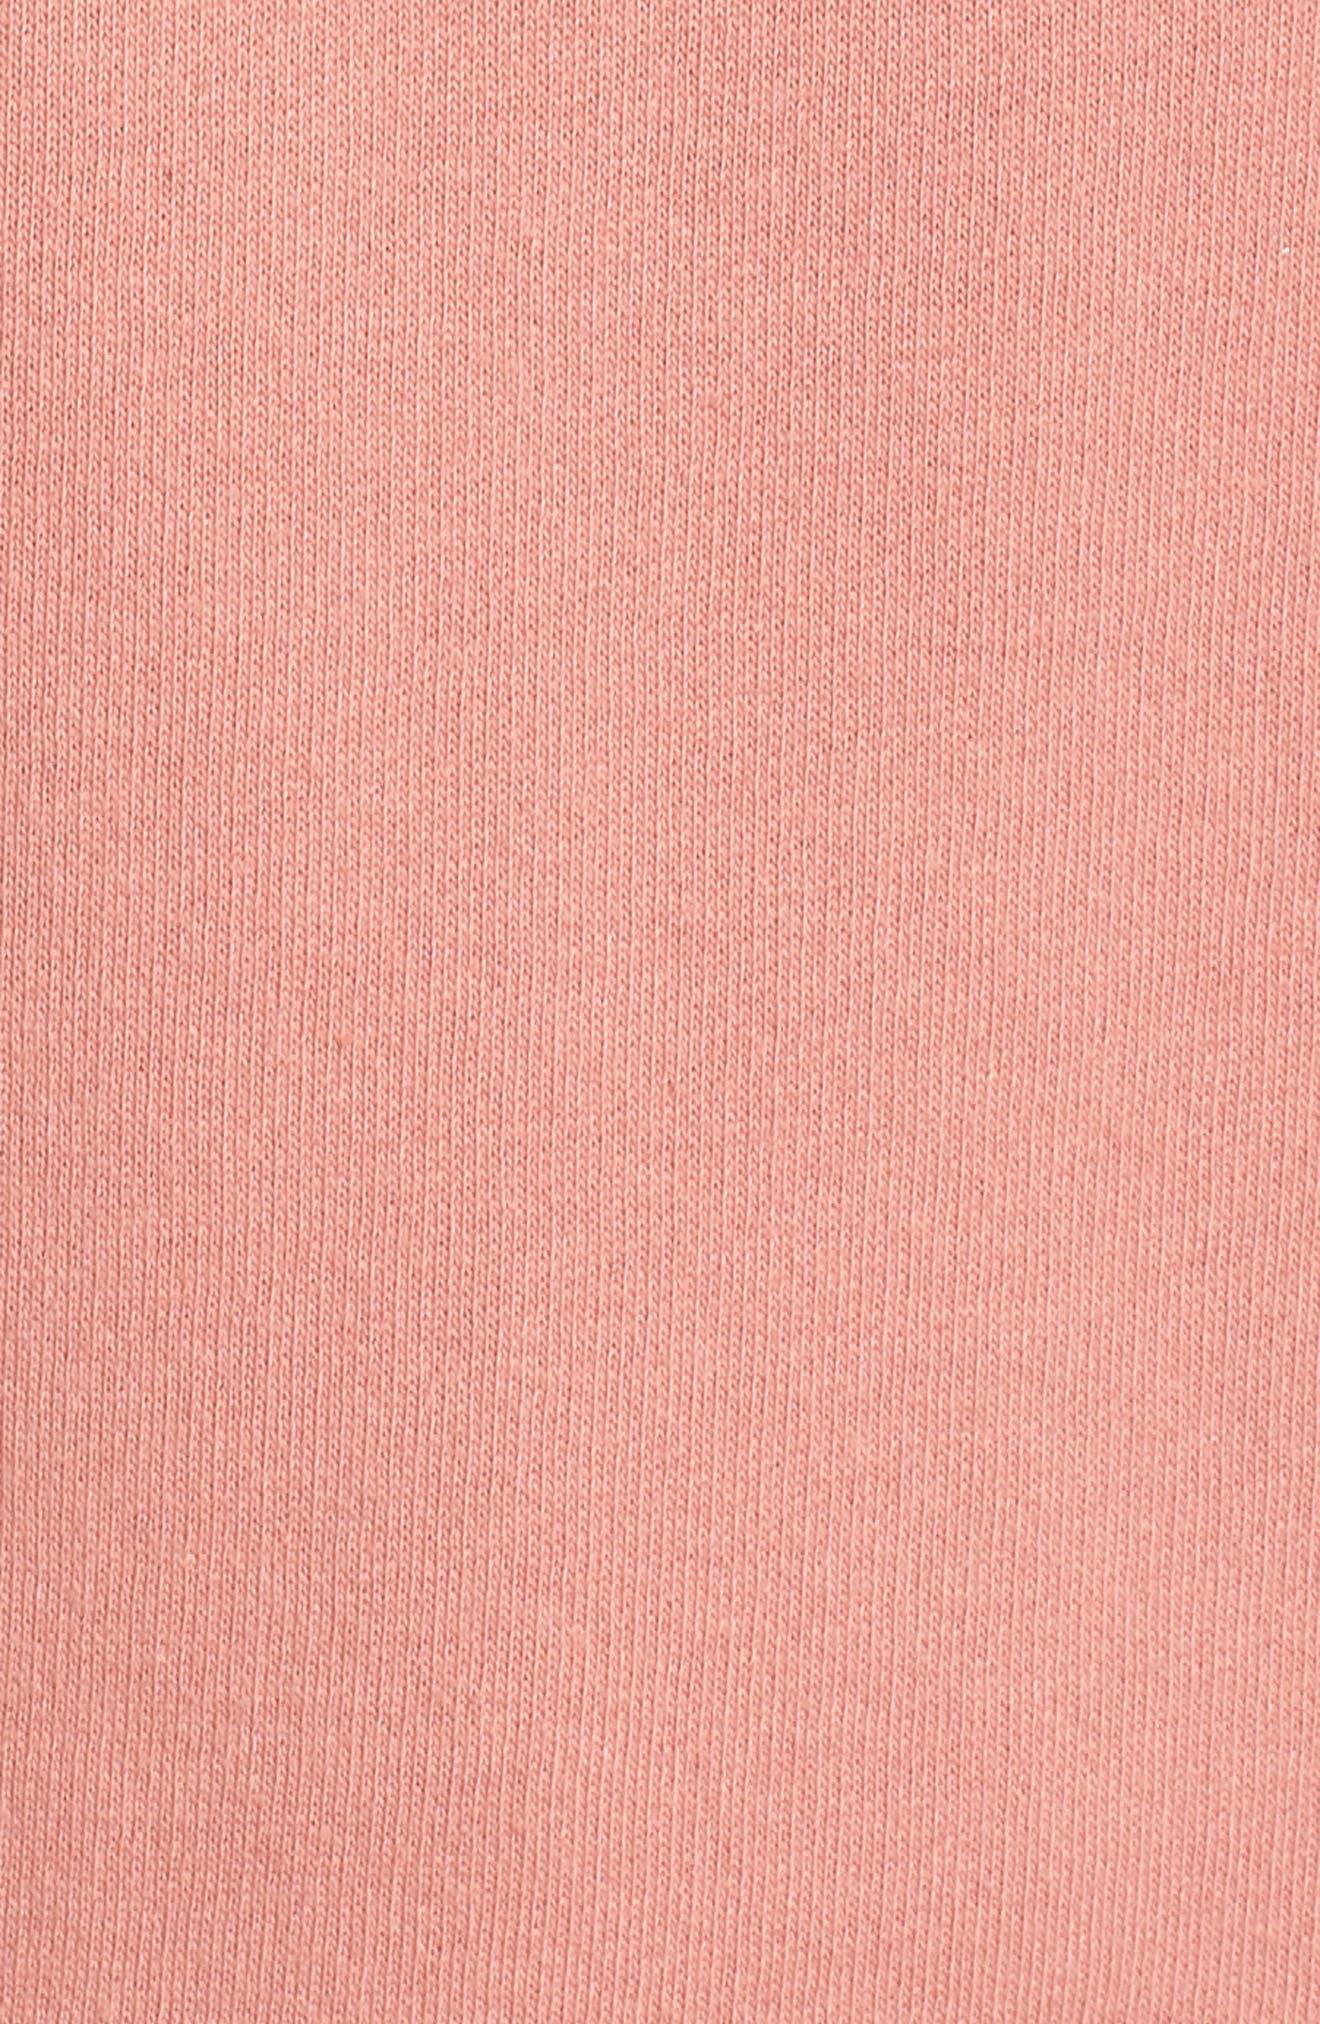 Redhead Crewneck Sweatshirt,                             Alternate thumbnail 6, color,                             Dusty Rose